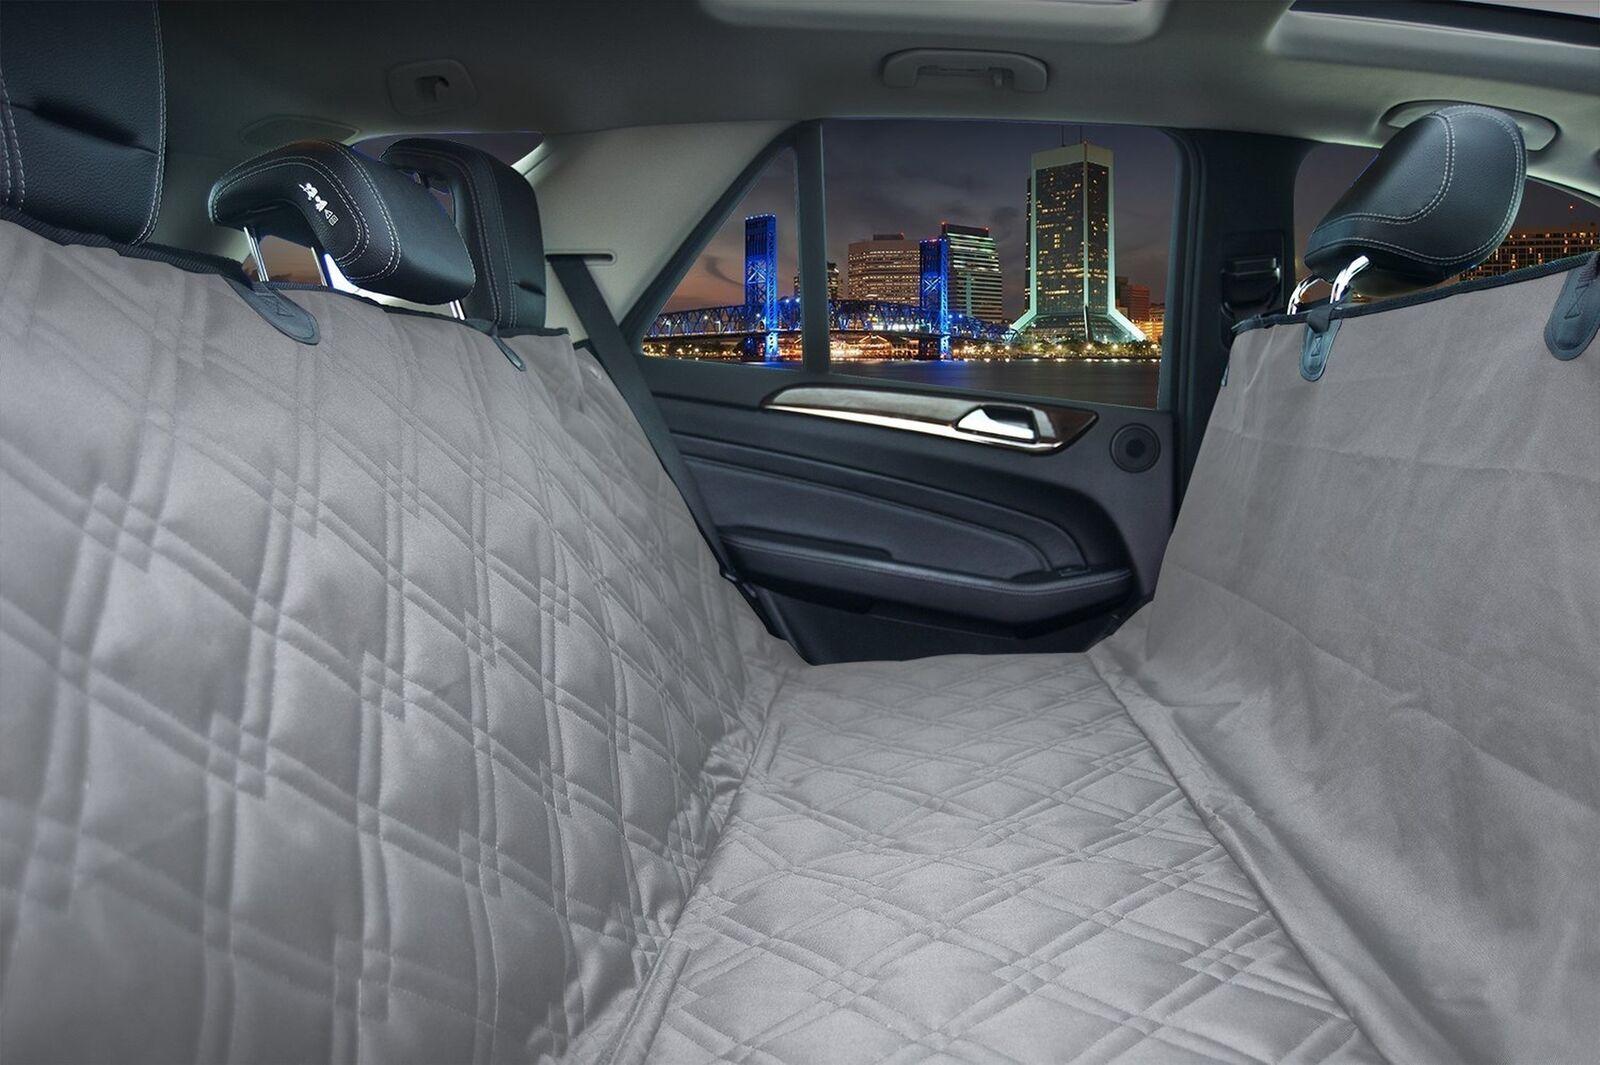 Bulldogology Heavy Duty Dog Car Seat Covers for All Vehicles XL 60x64  grigio